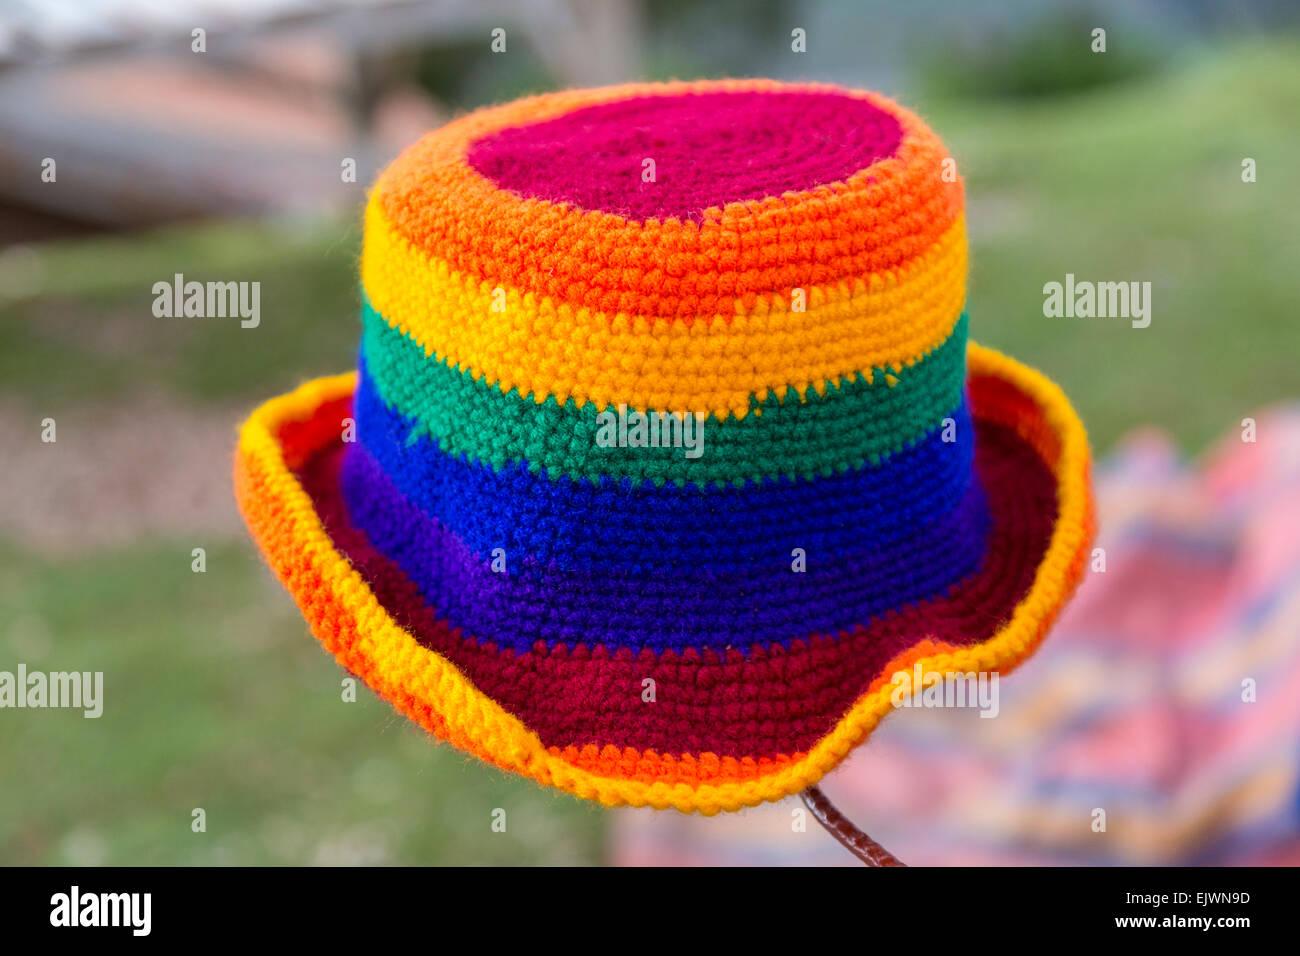 Peru, Urubamba Valley.  Peruvian Hat, Traditional Incan Rainbow Colors. - Stock Image